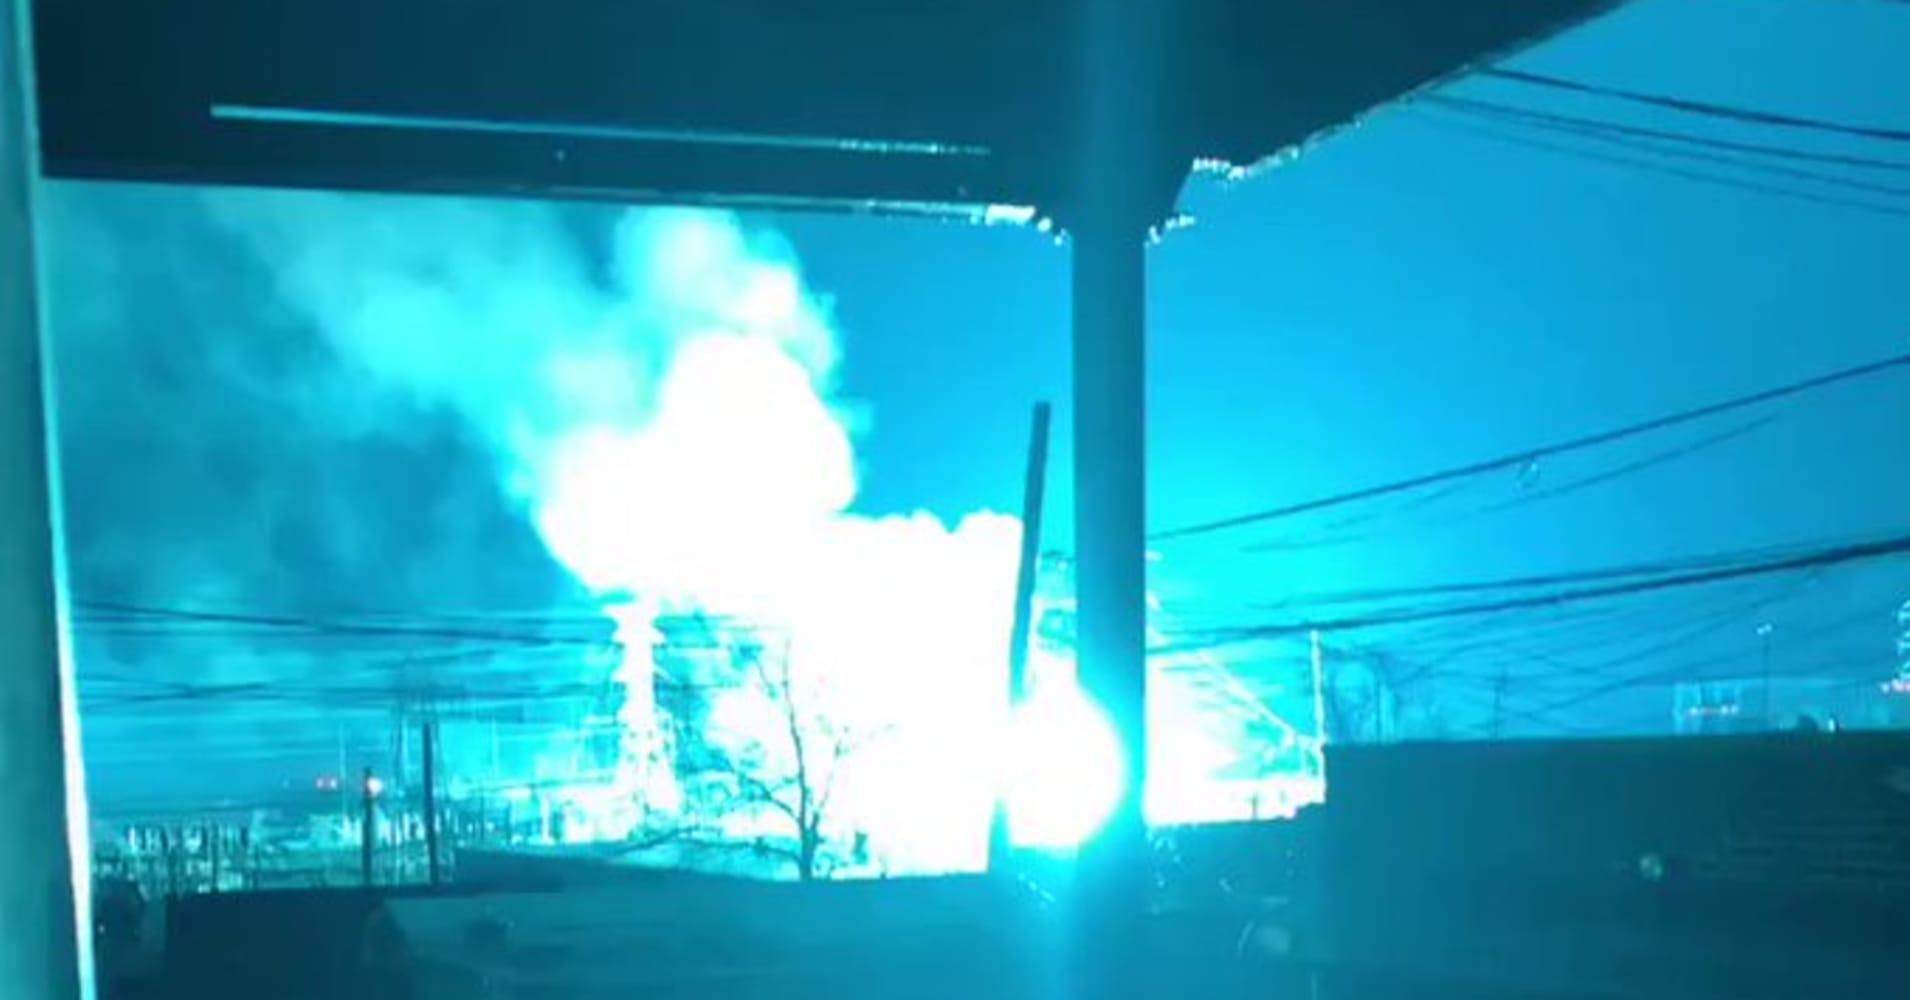 Transformer explosion in New York City lights up night sky